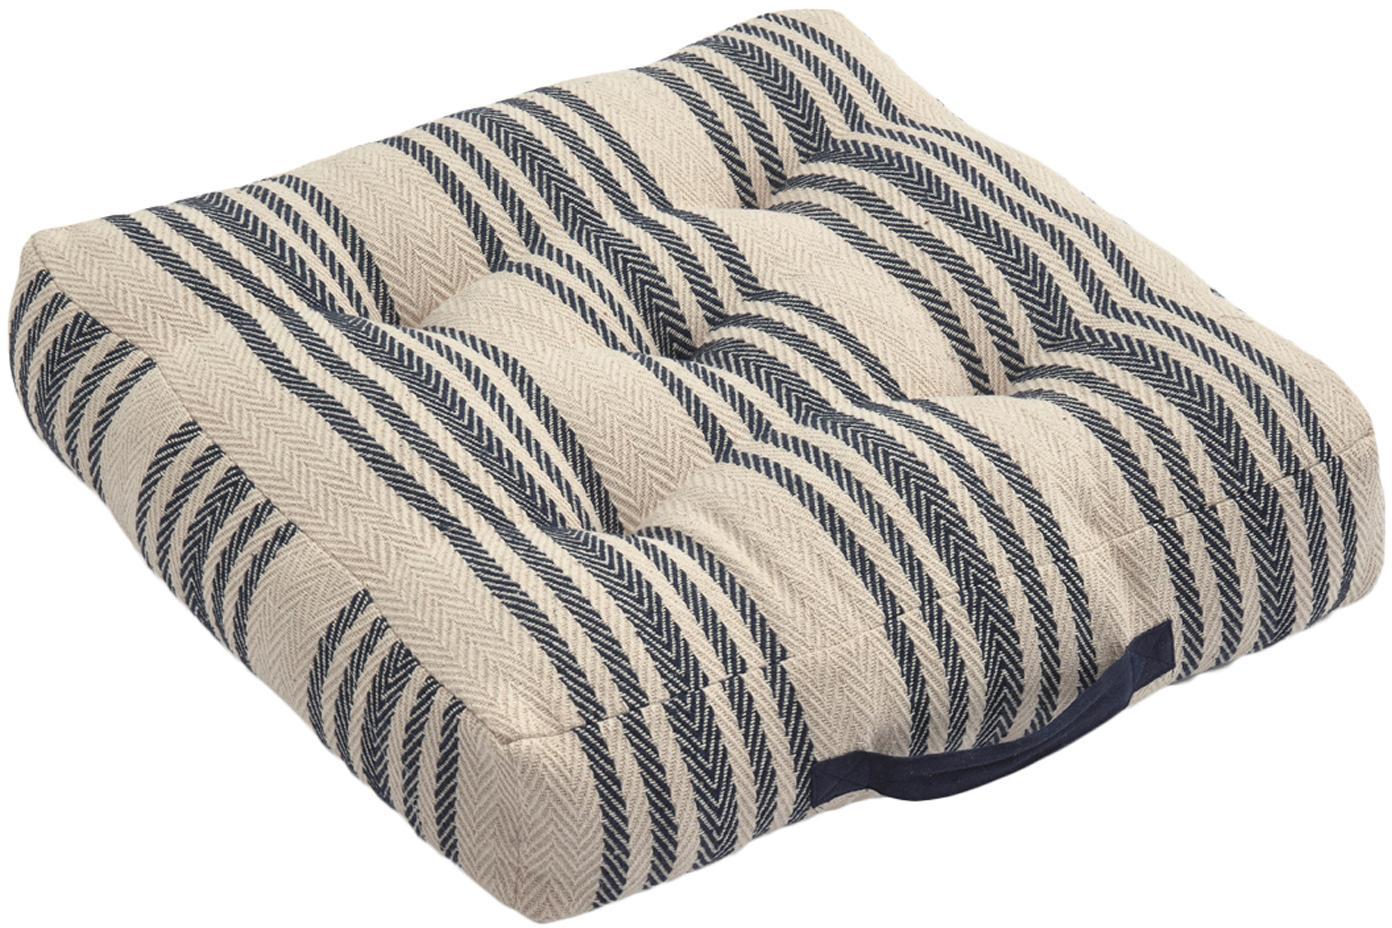 Cuscino da pavimento a righe Puket, Blu scuro, bianco, Larg. 60 x Lung. 13 cm